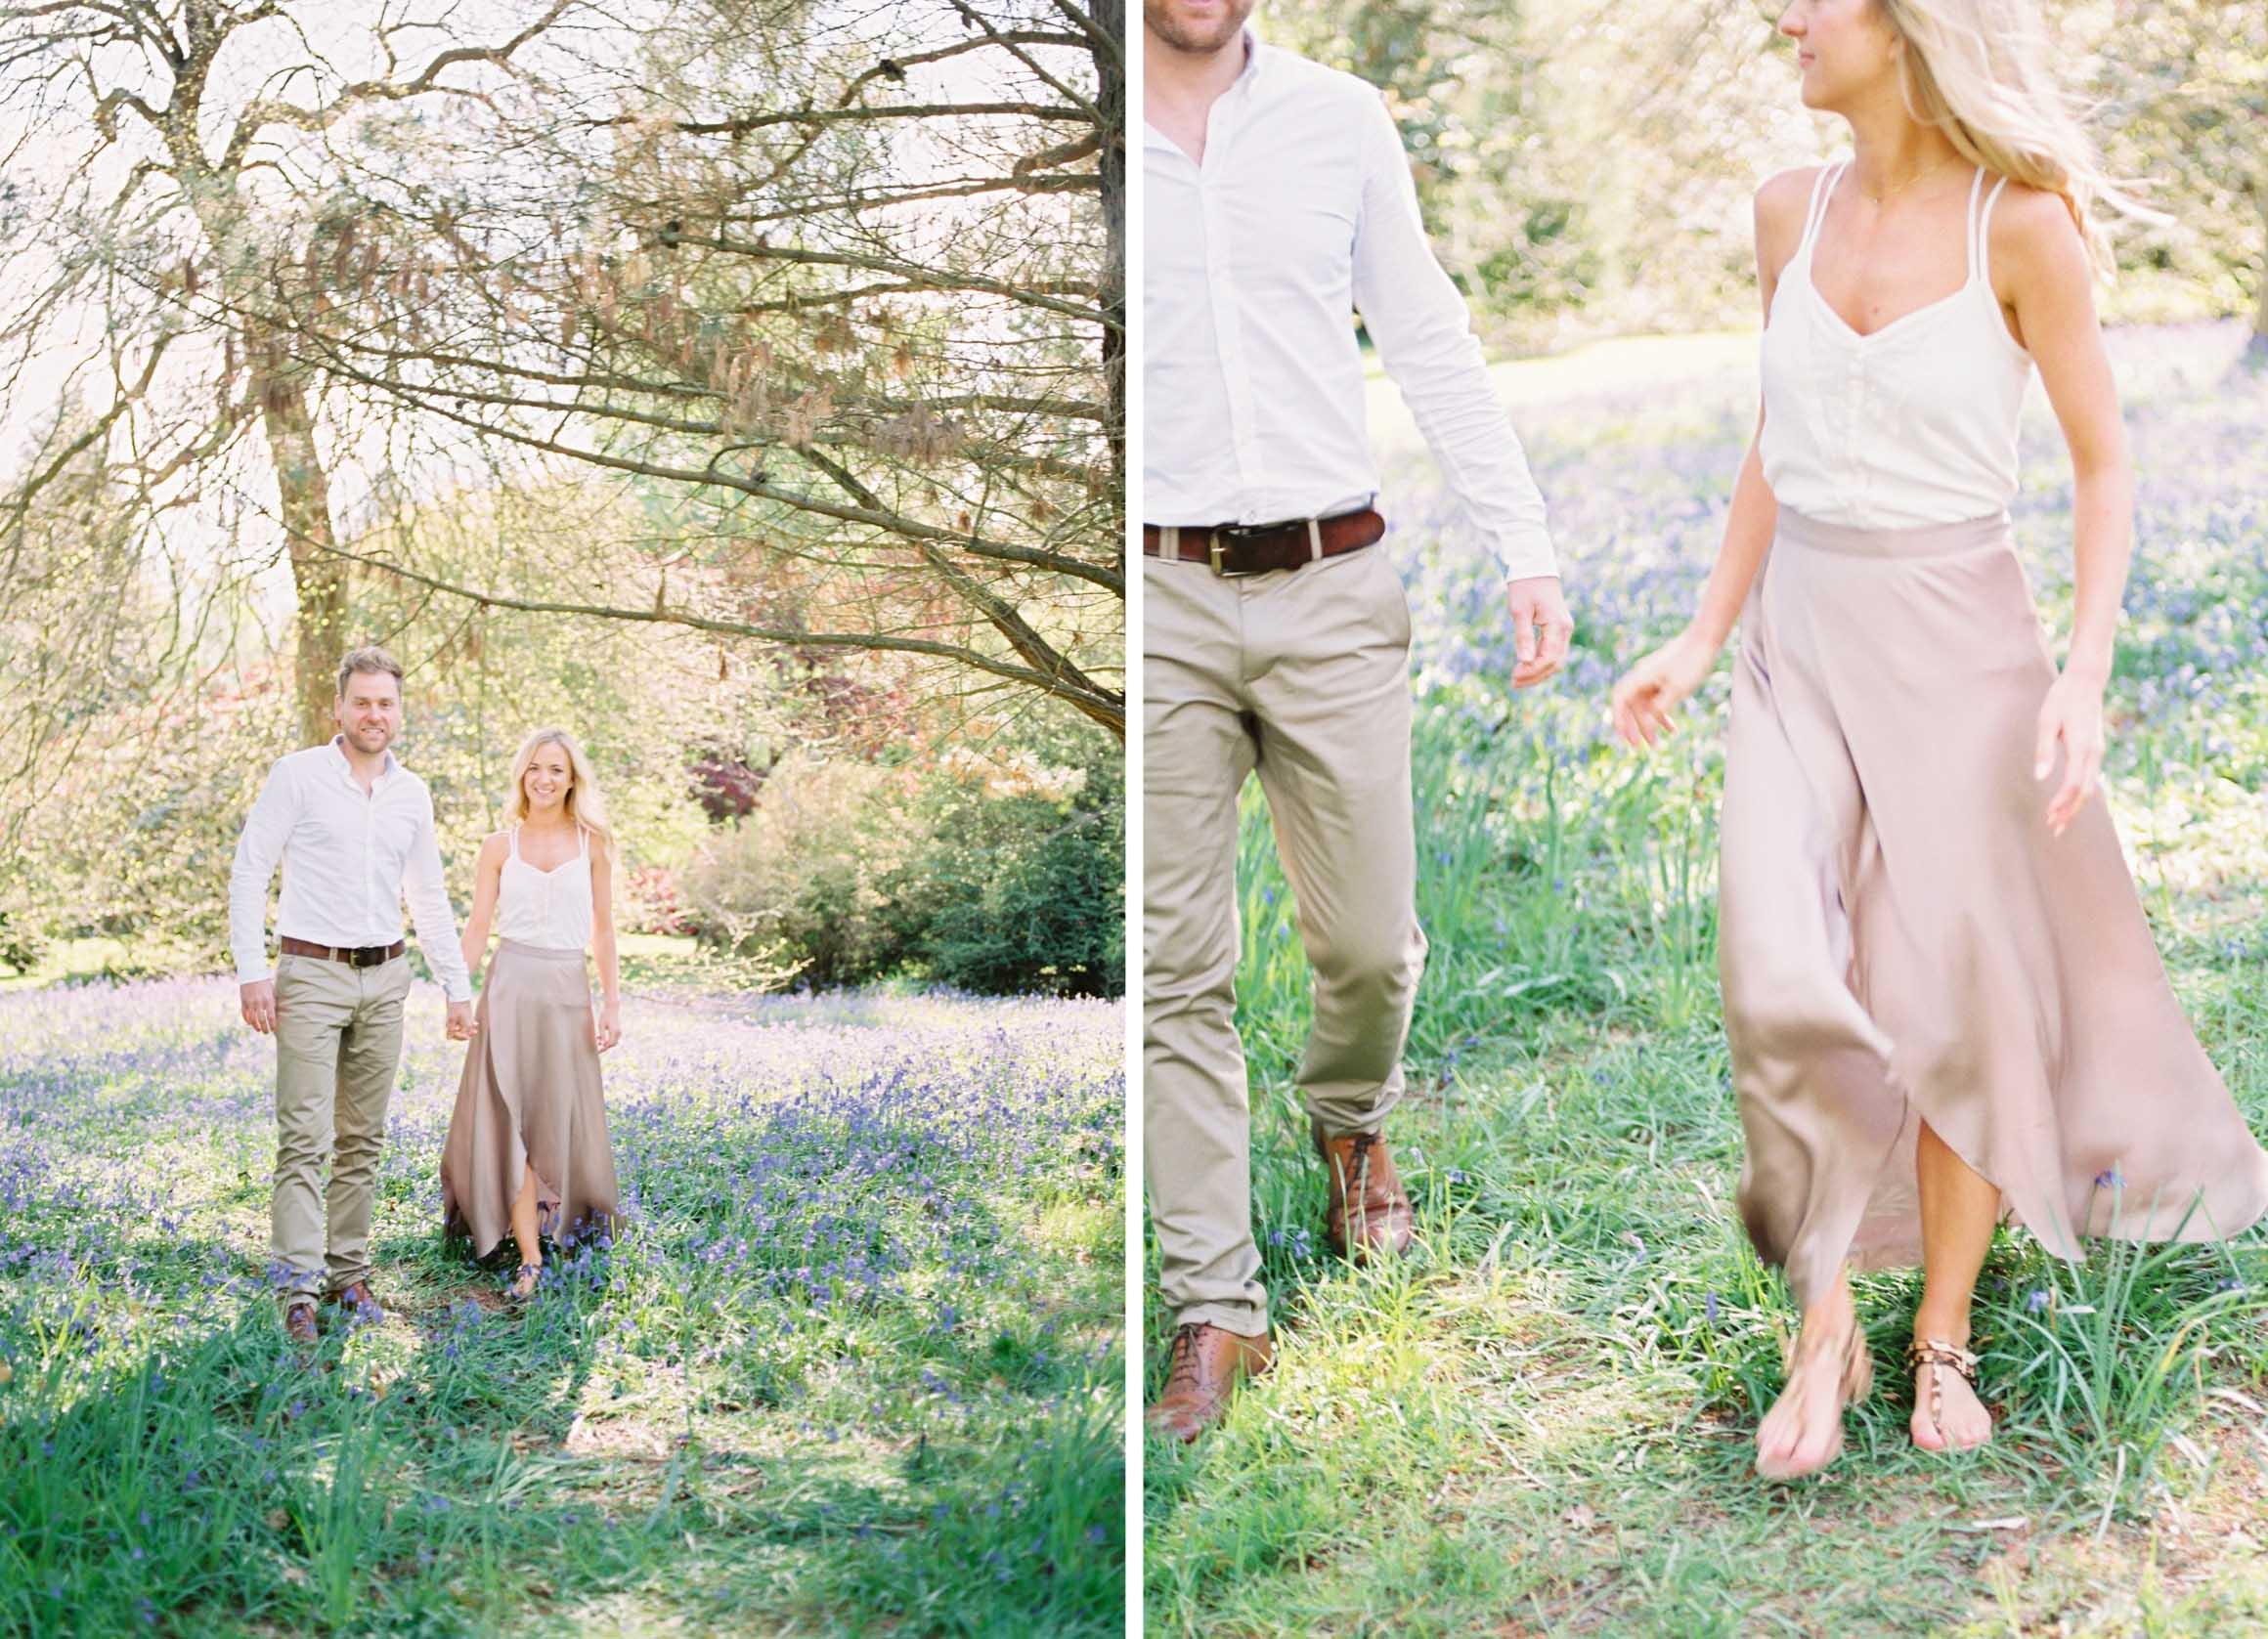 Amy O'Boyle Photography- Destination & UK Fine Art Film Wedding Photographer- Sheffield Park Garden National Trust Spring Engagement Shoot 4.jpg